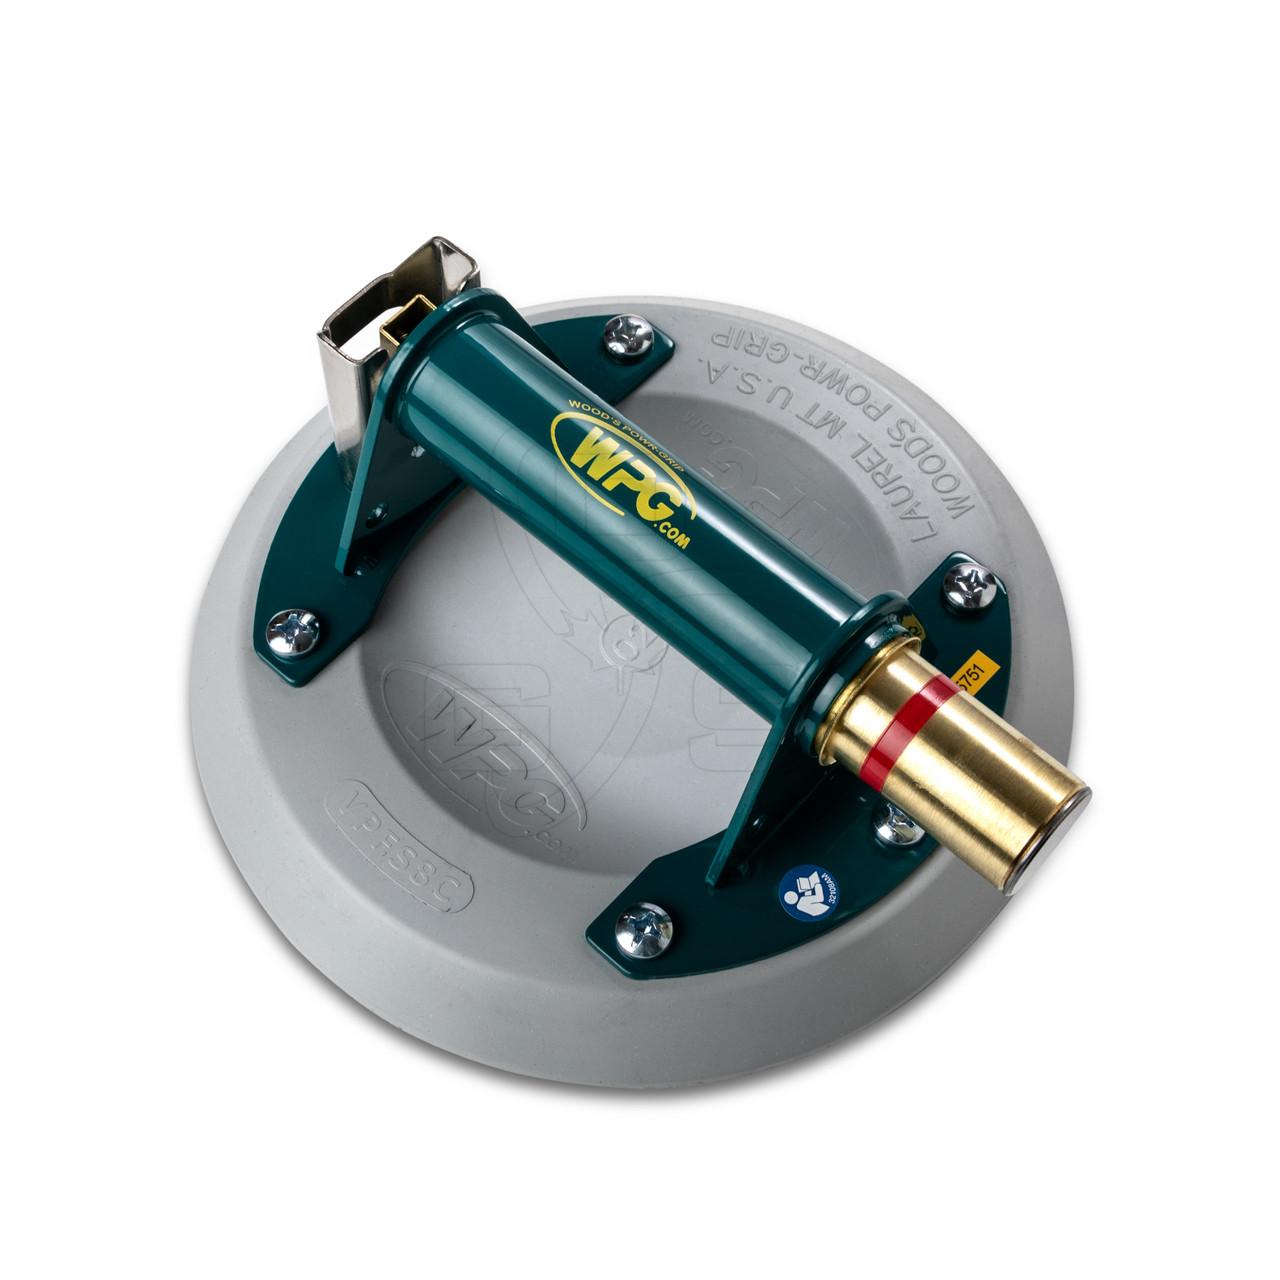 8x10x15 mm SF-1 Self Lubricating Composite Bearing Bushing Sleeve Choose Qty